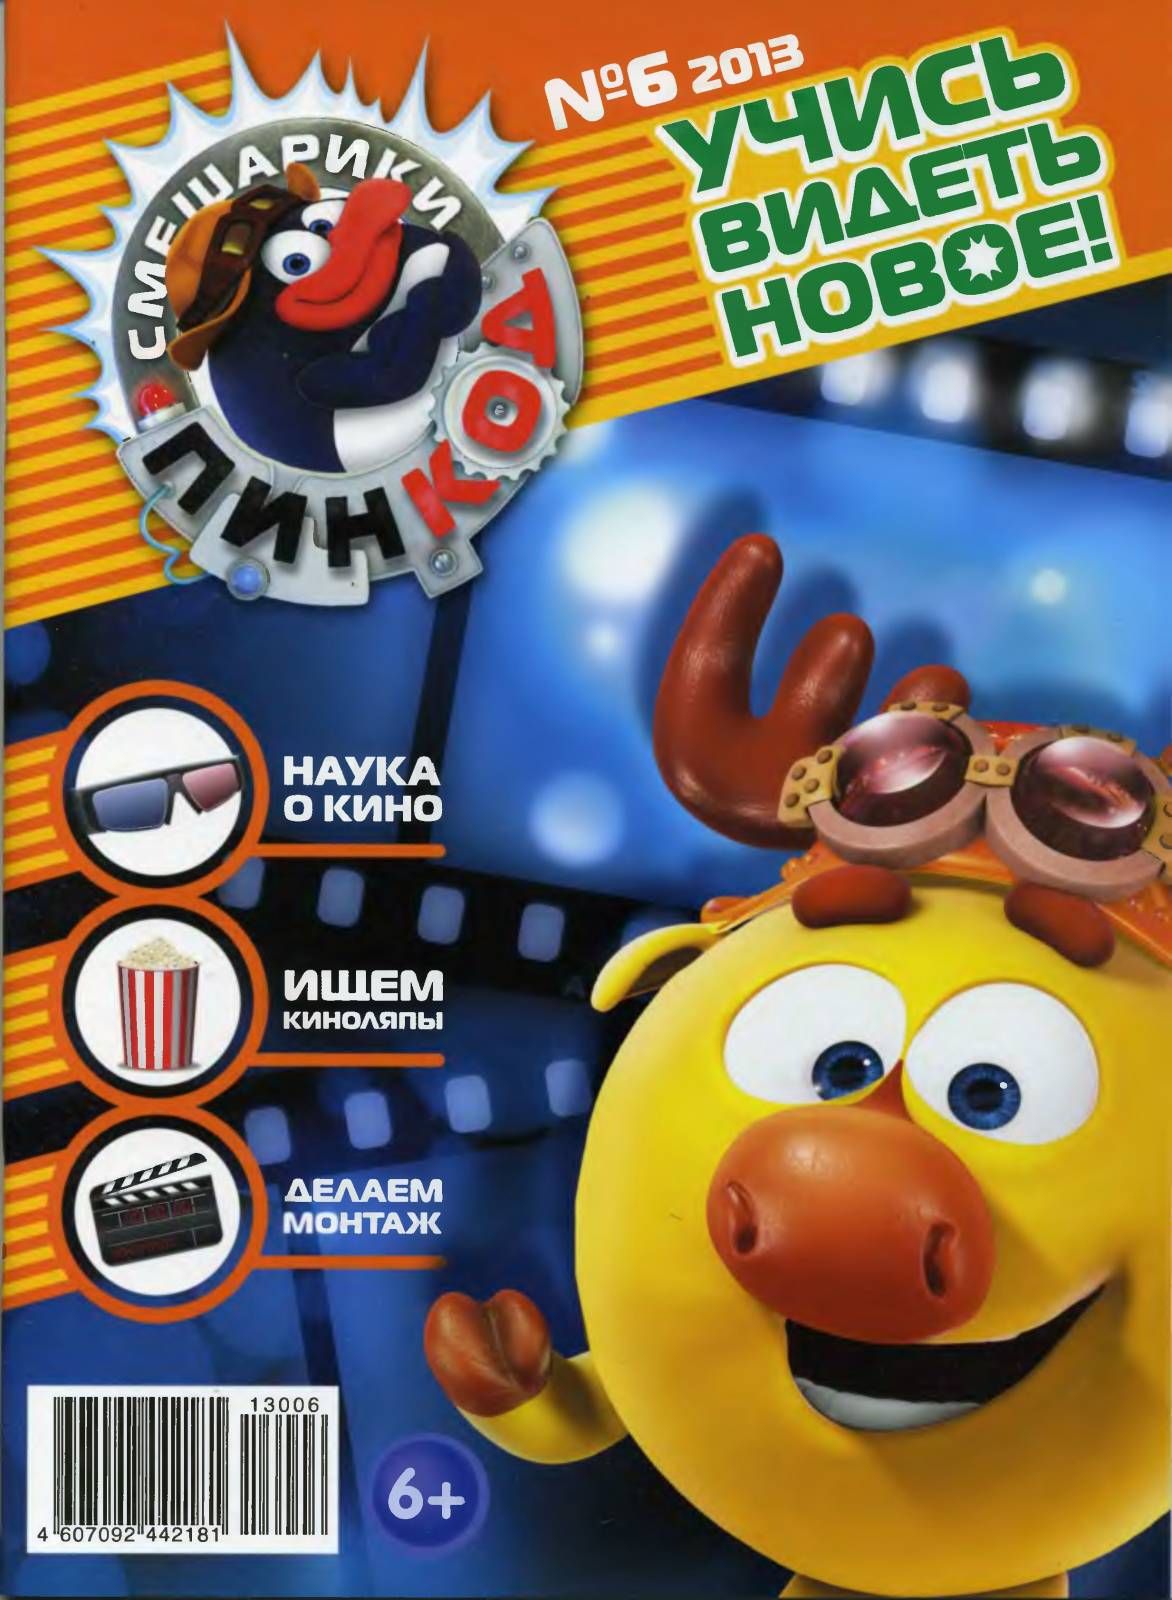 Смешарики Пин-код №6 (2013)Детские журналы,Комиксы - 27 Мая 2014 ...